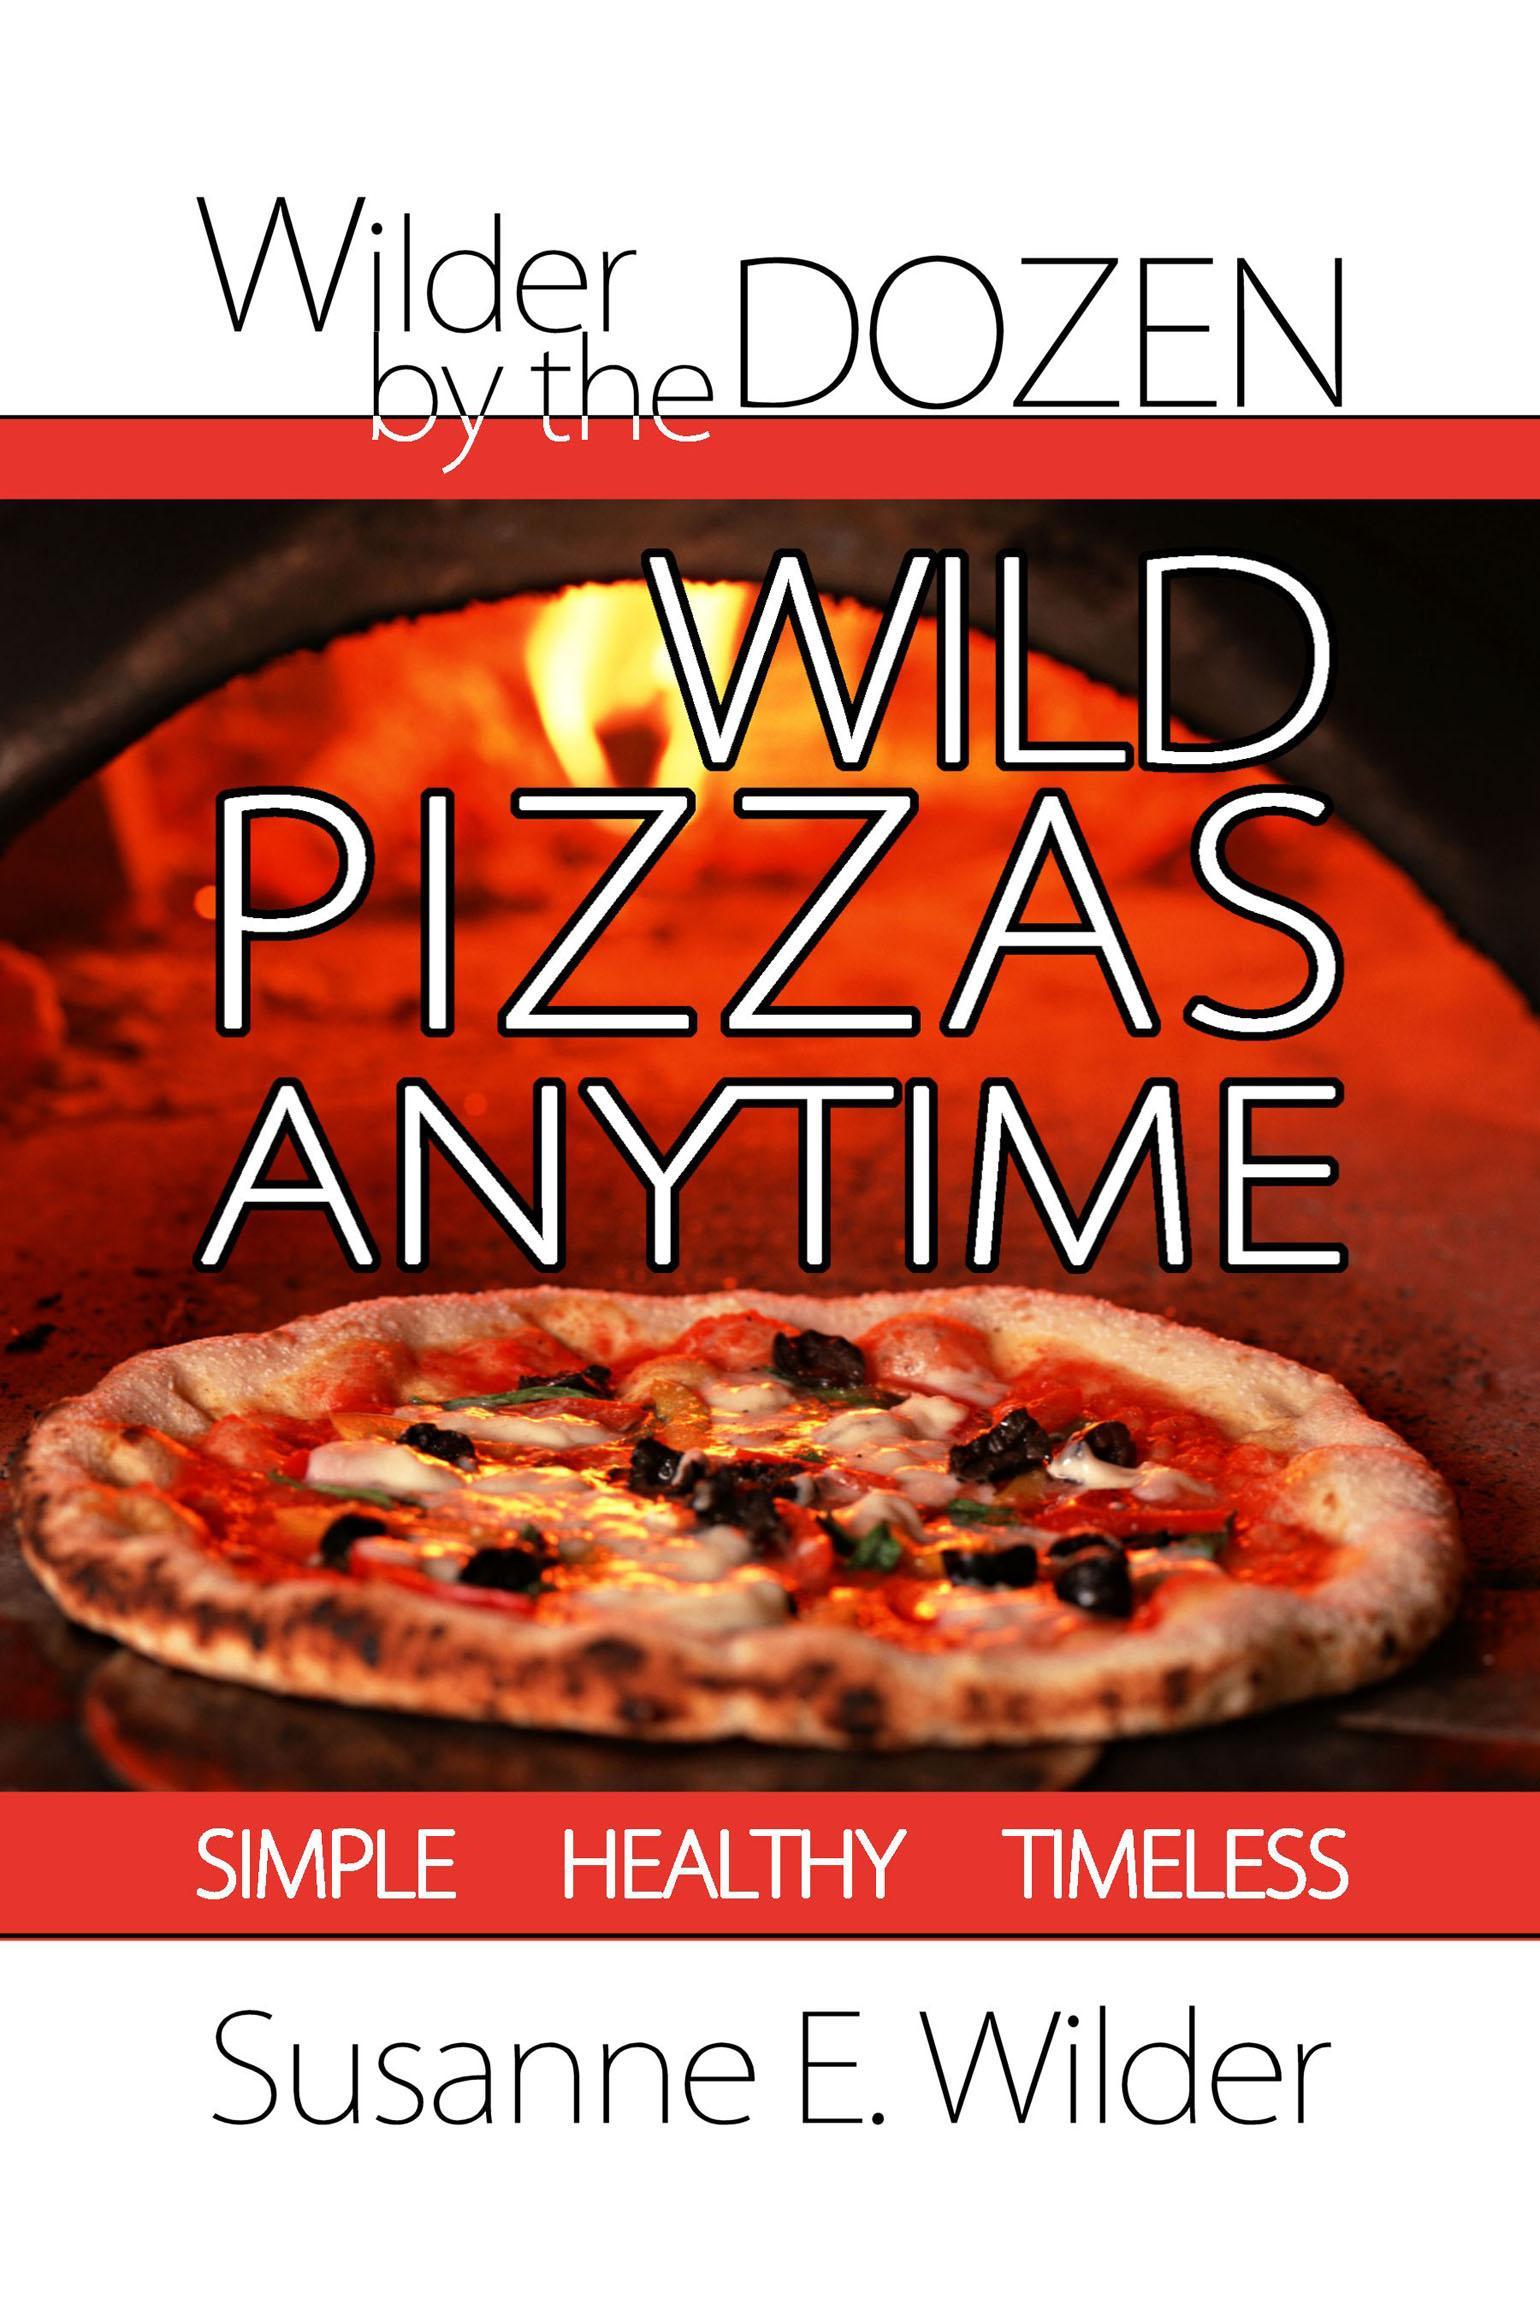 Wild Pizzas Anytime